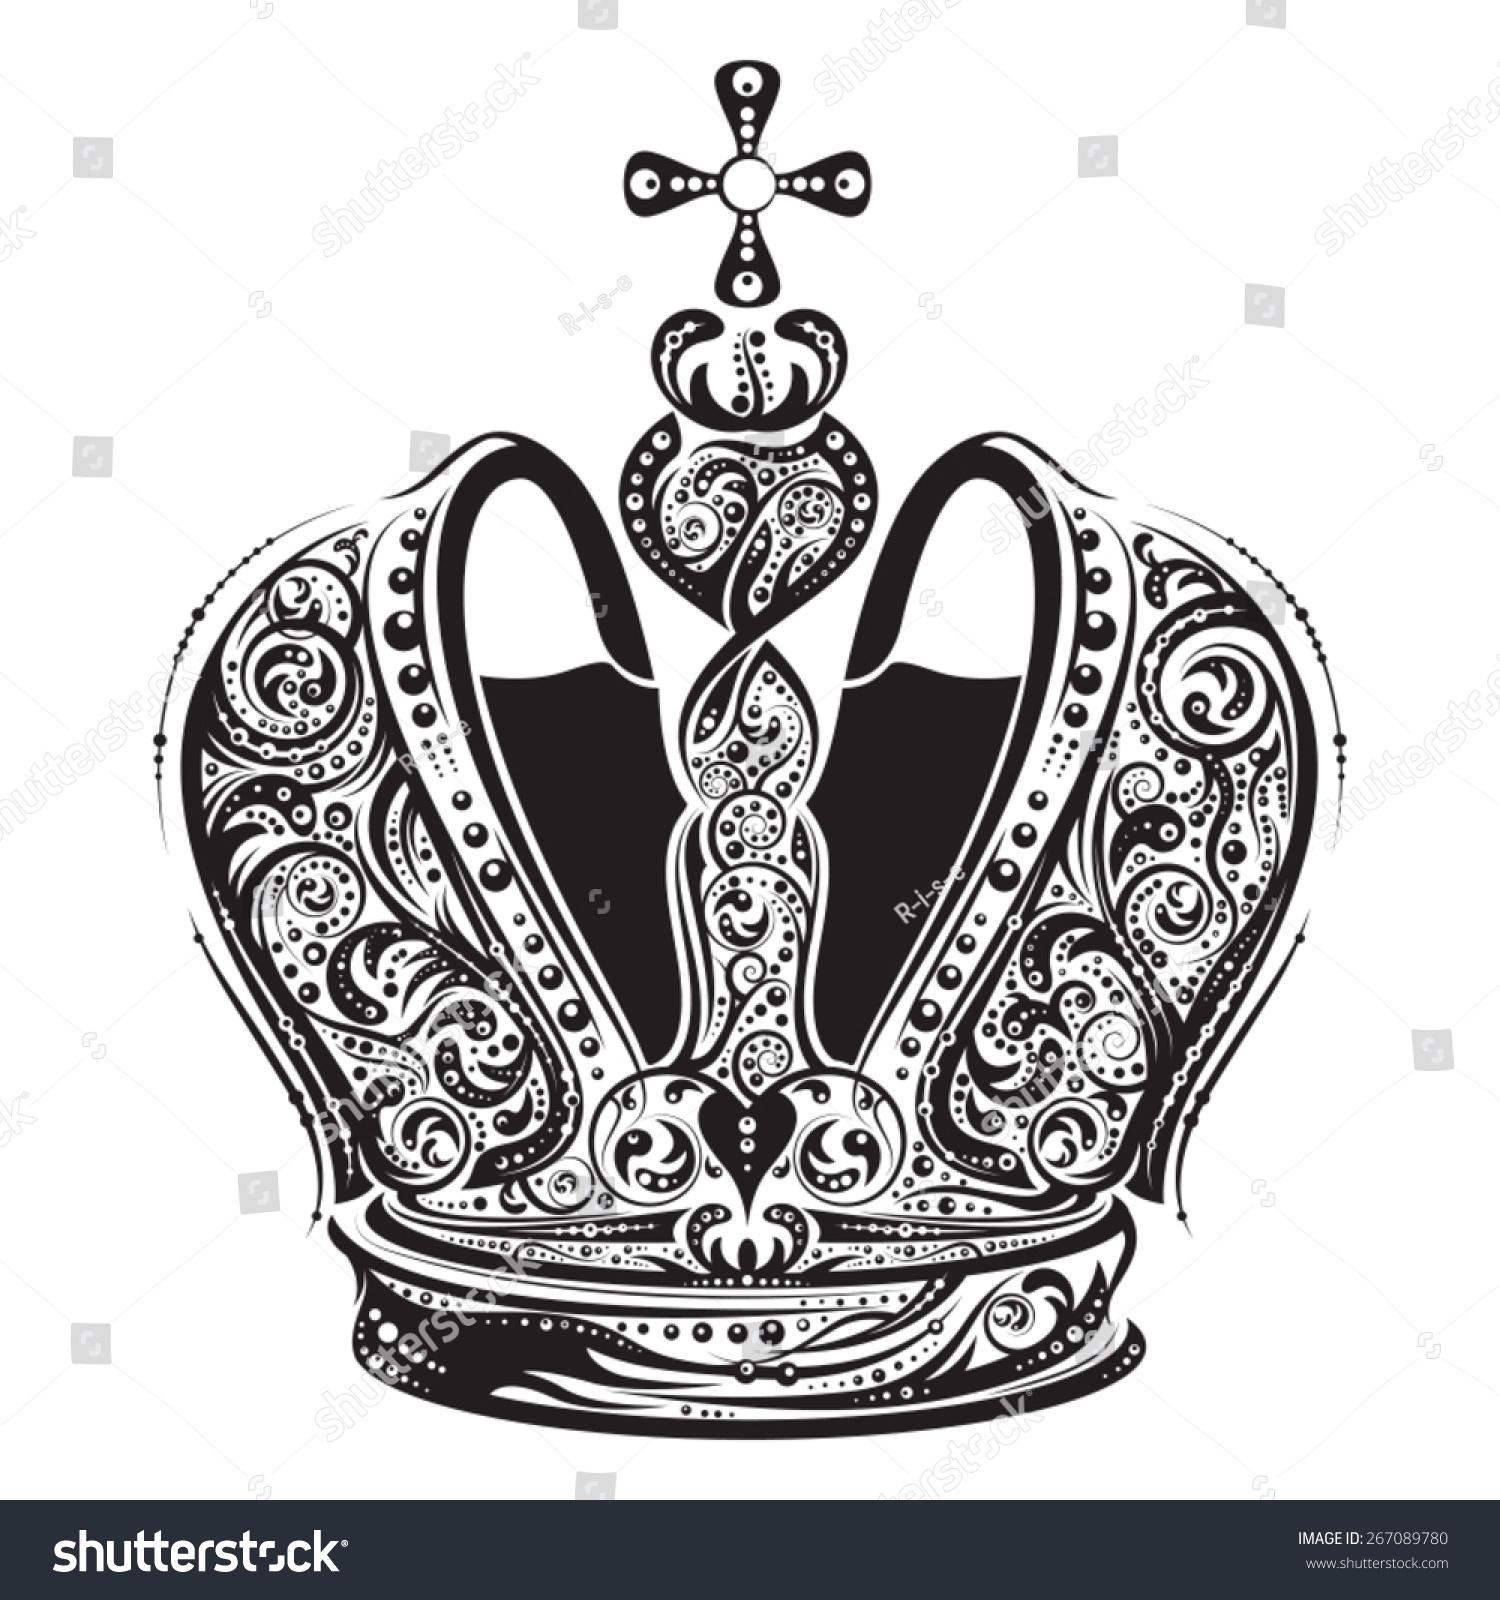 imperial crown tattoo designs. Black Bedroom Furniture Sets. Home Design Ideas